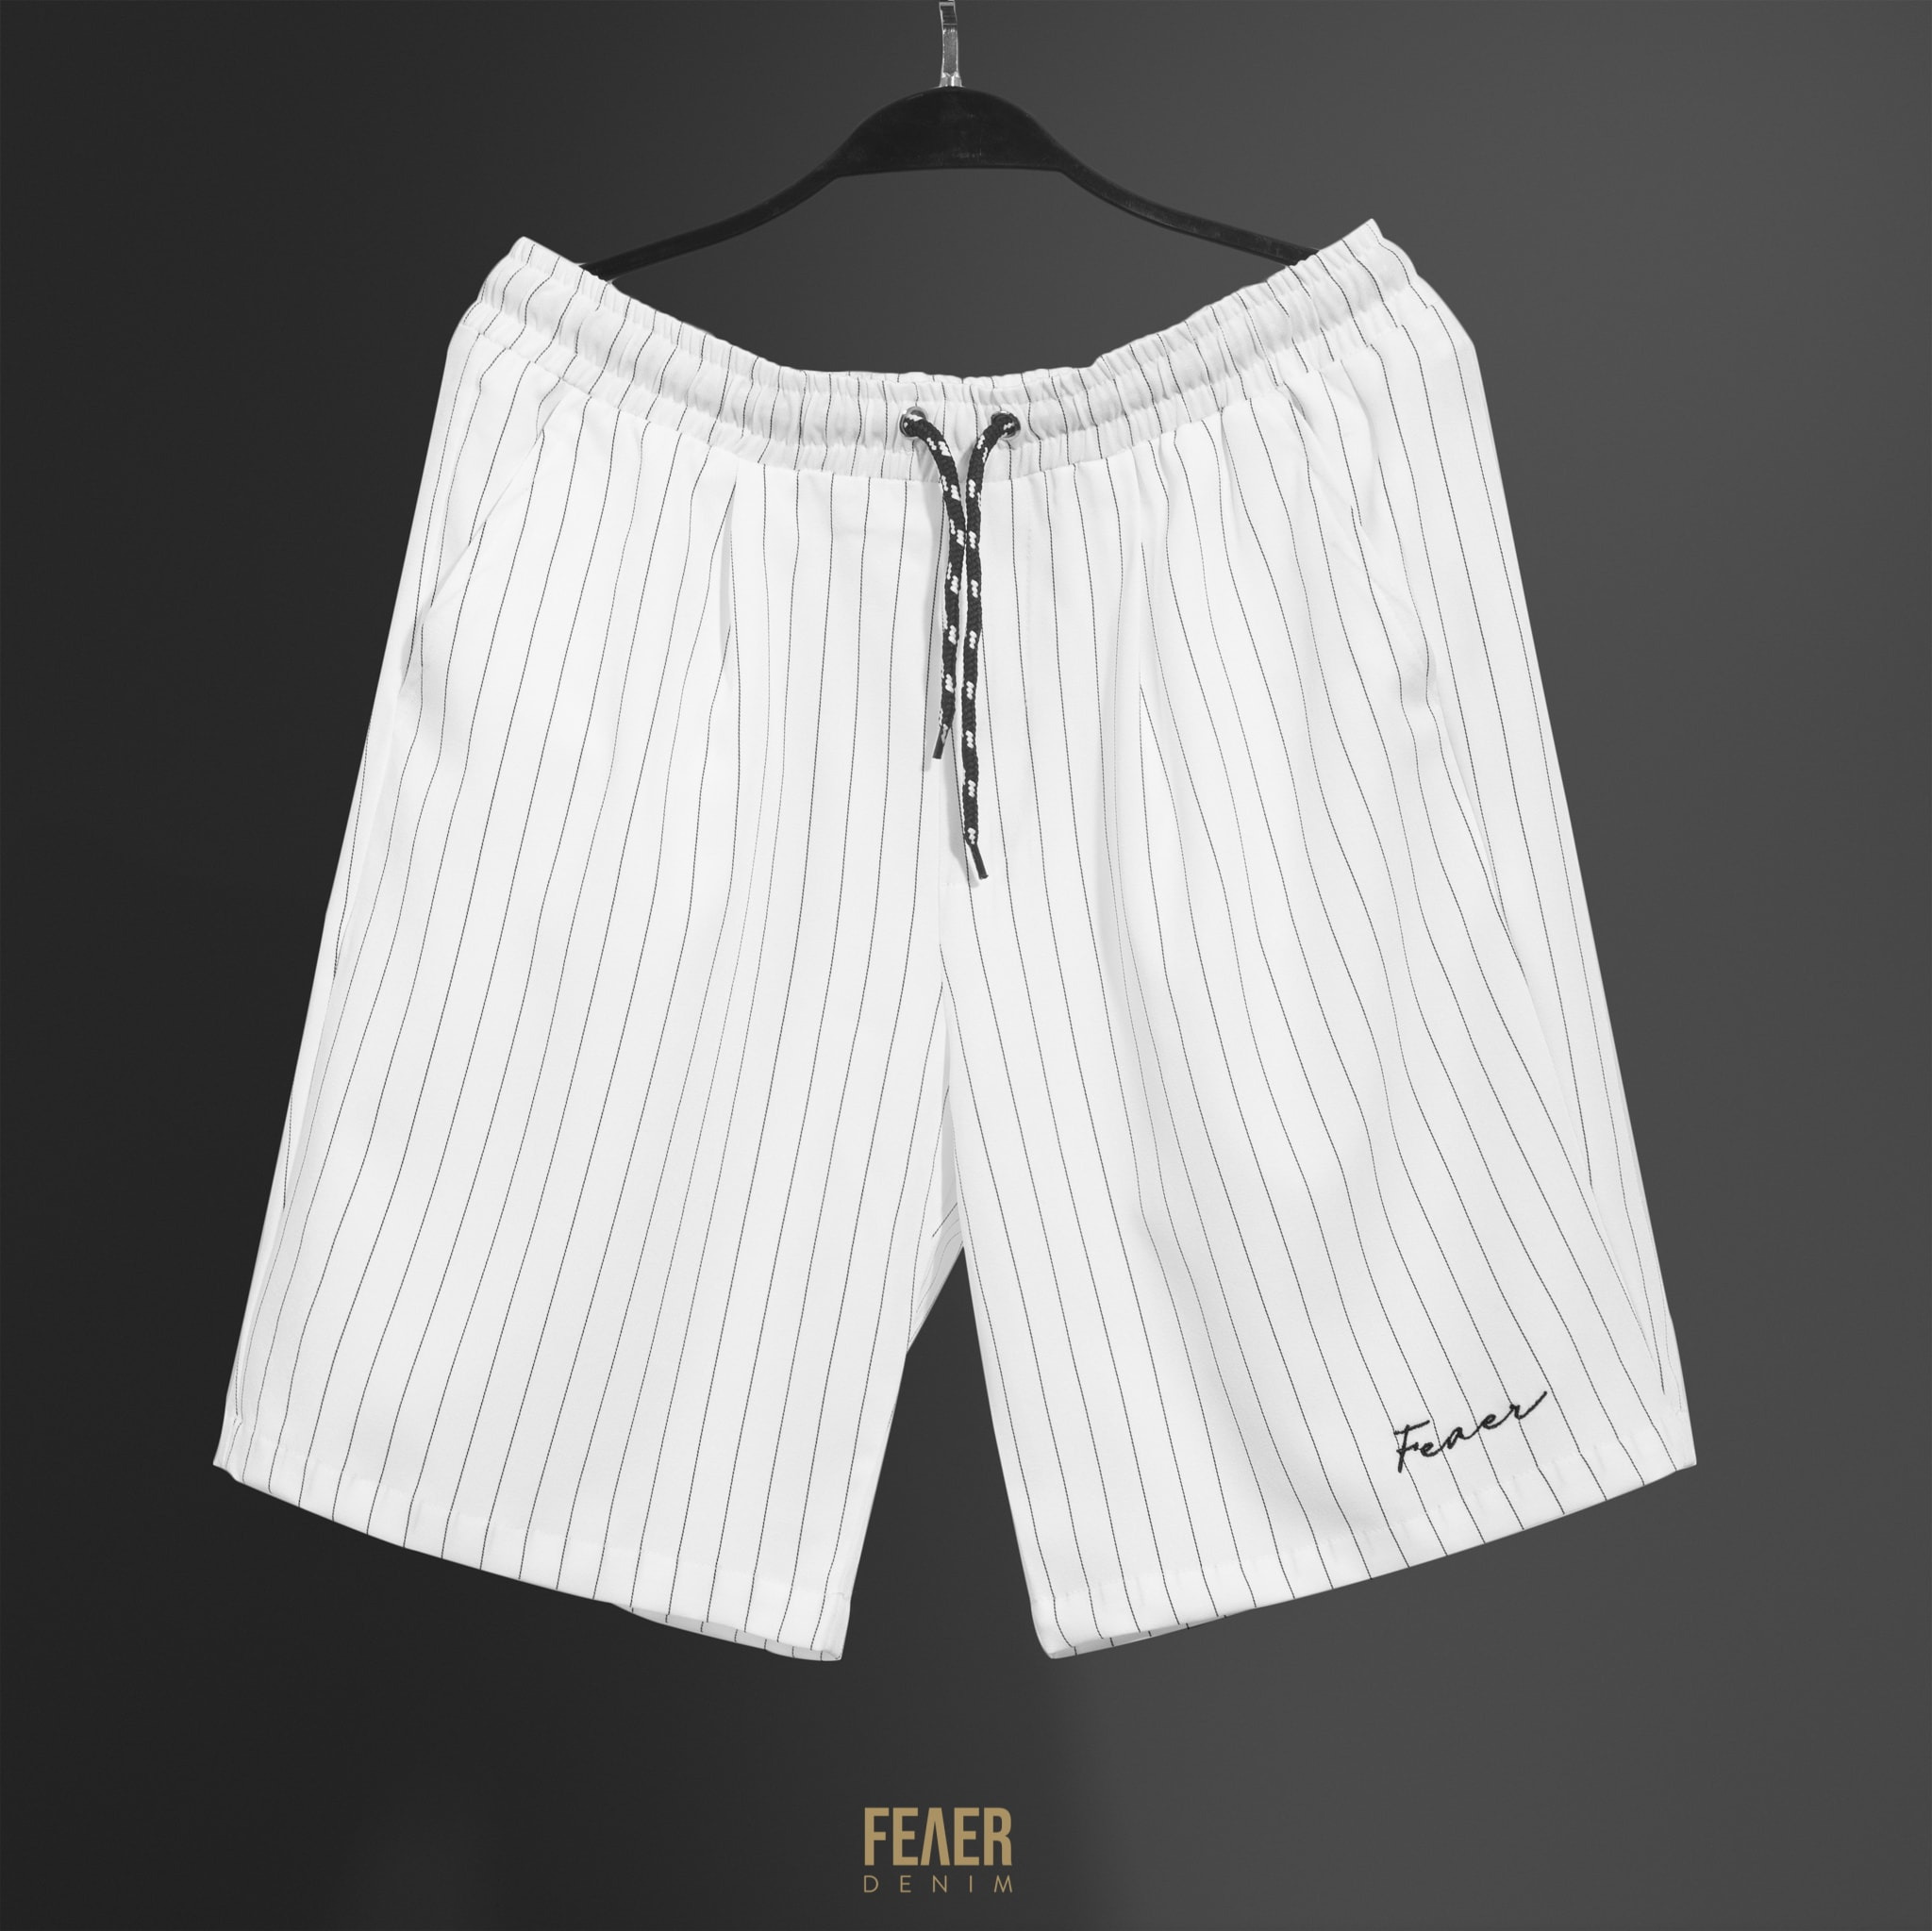 SP132 - Quần Striped Feaer